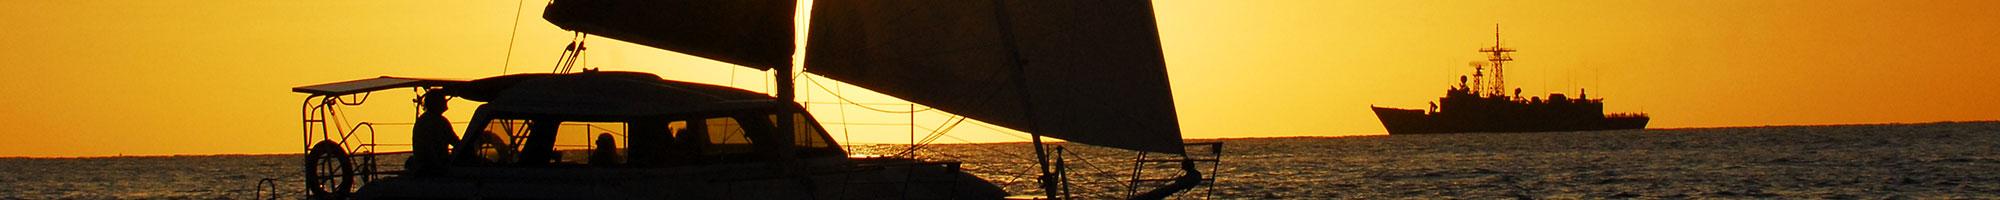 sunrise-seawind-2000x200px